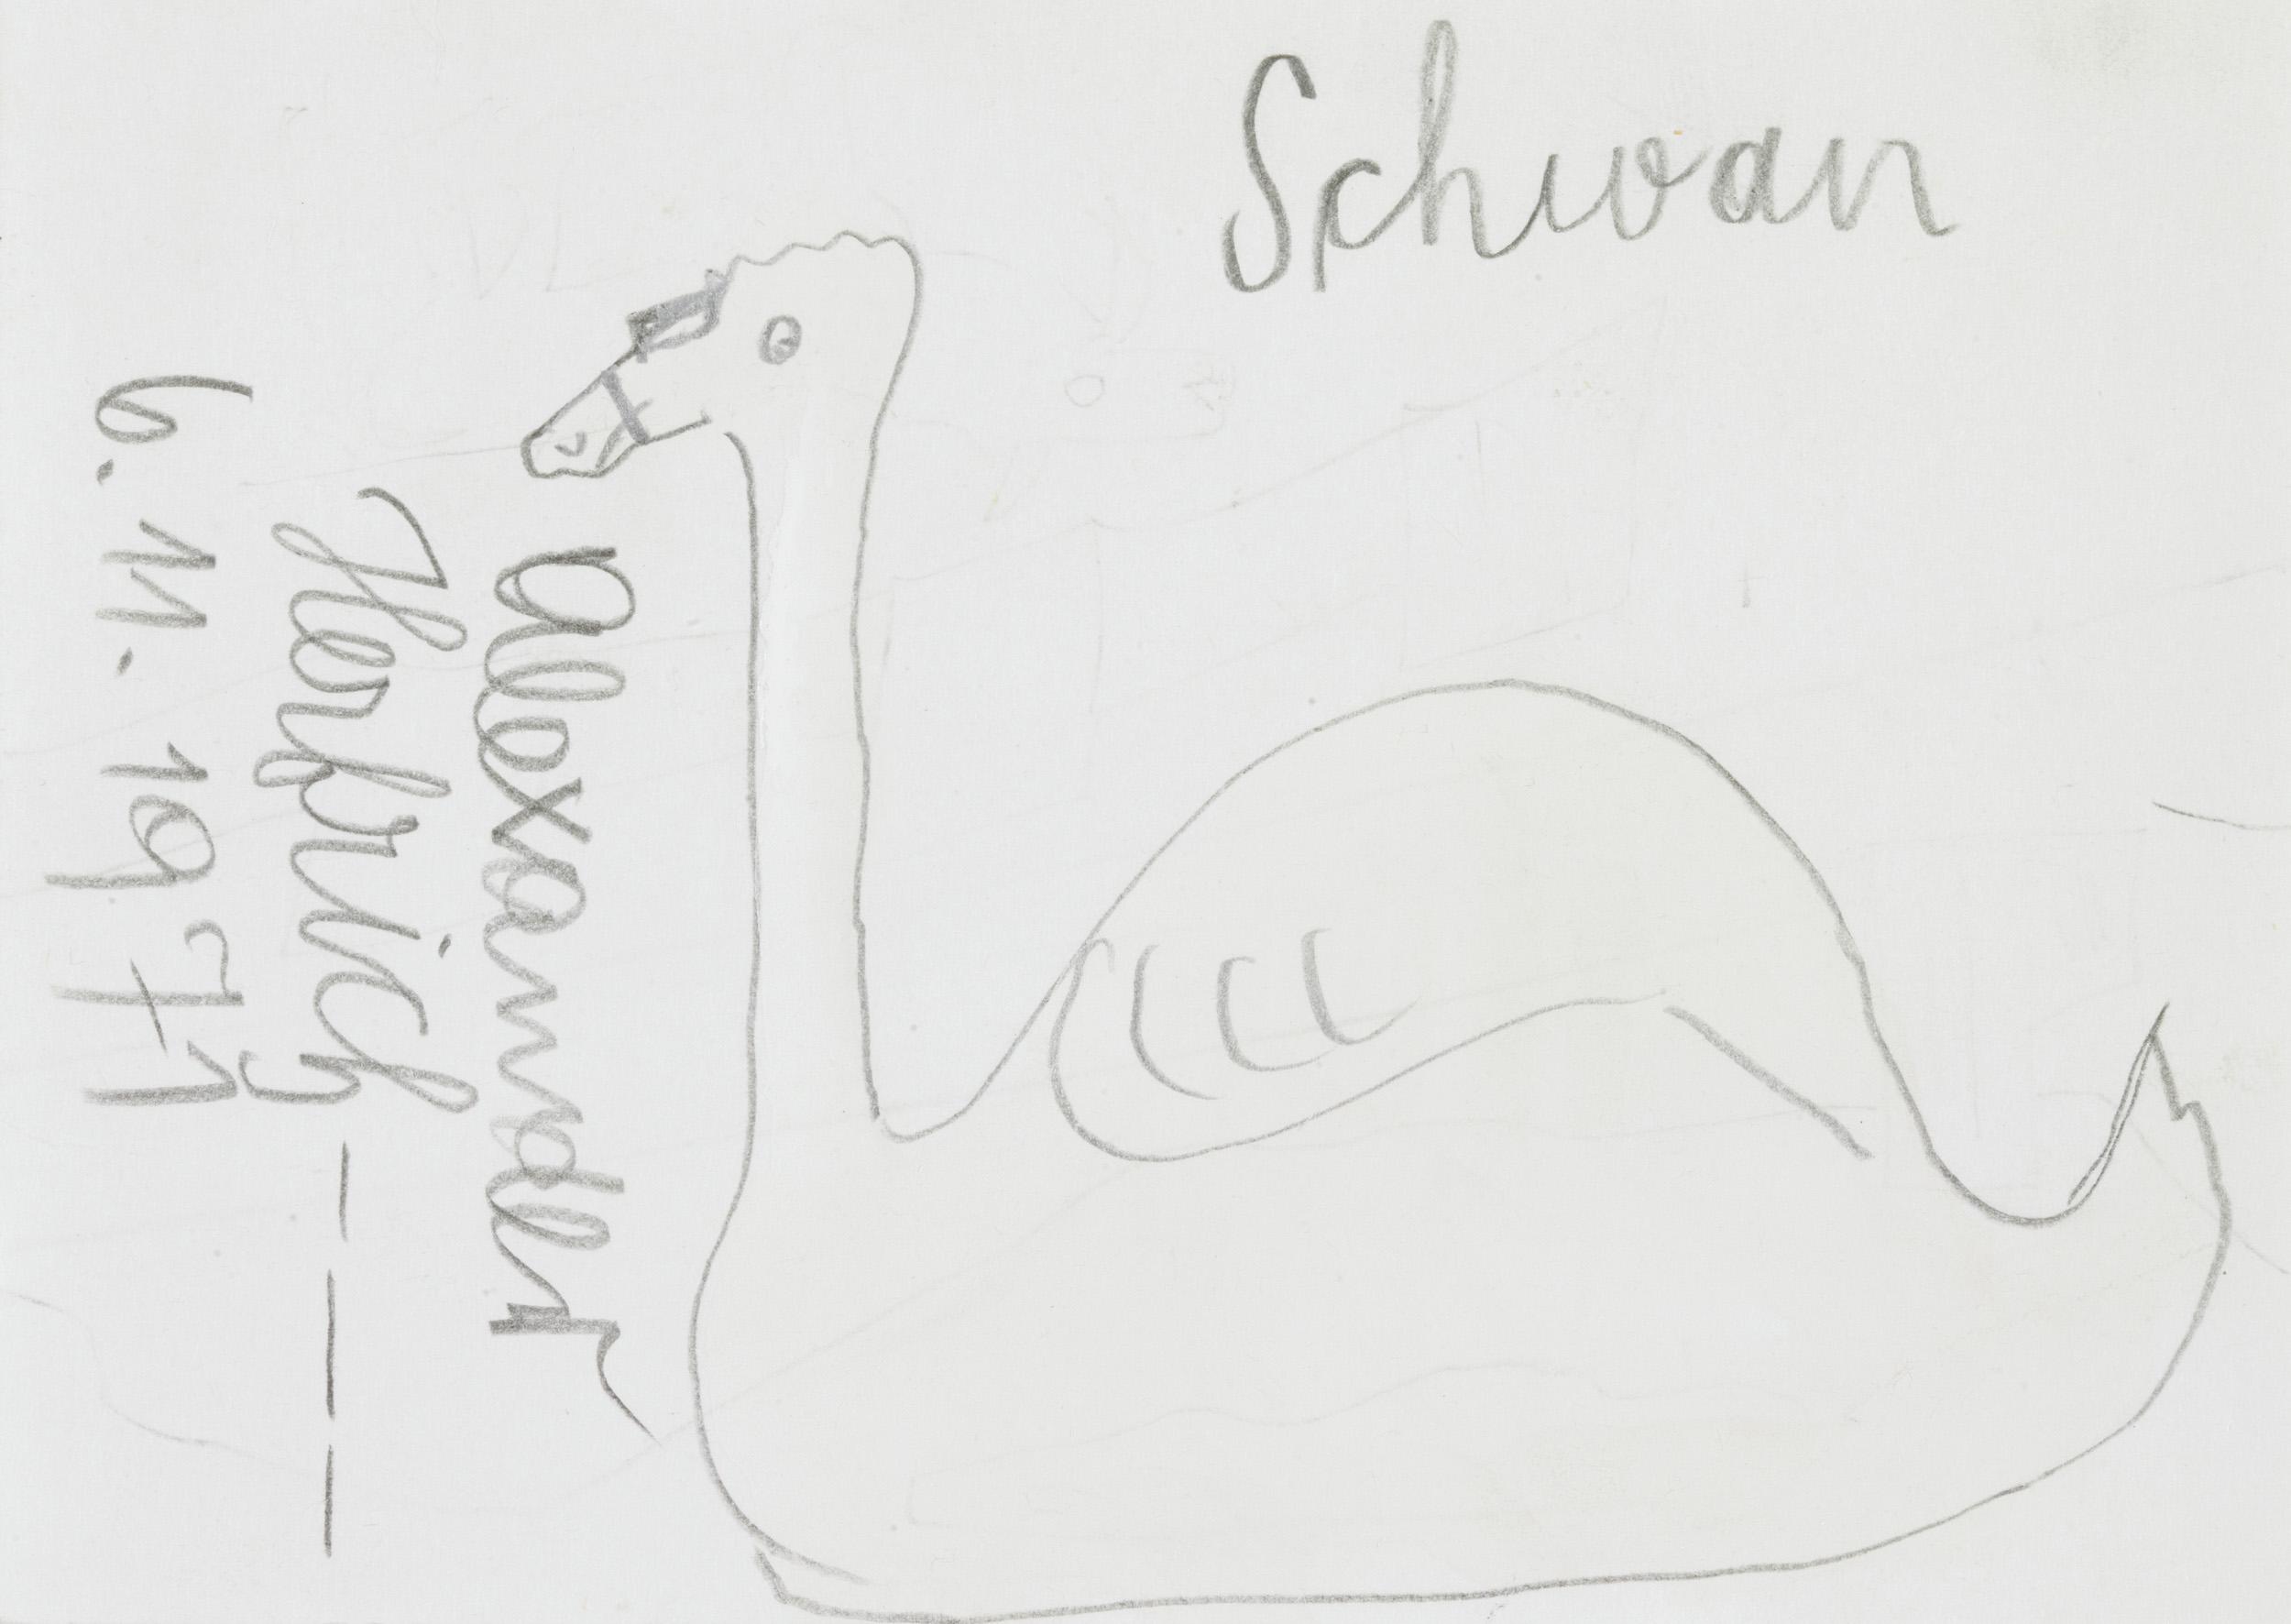 herbeck ernst - Schwan / swan